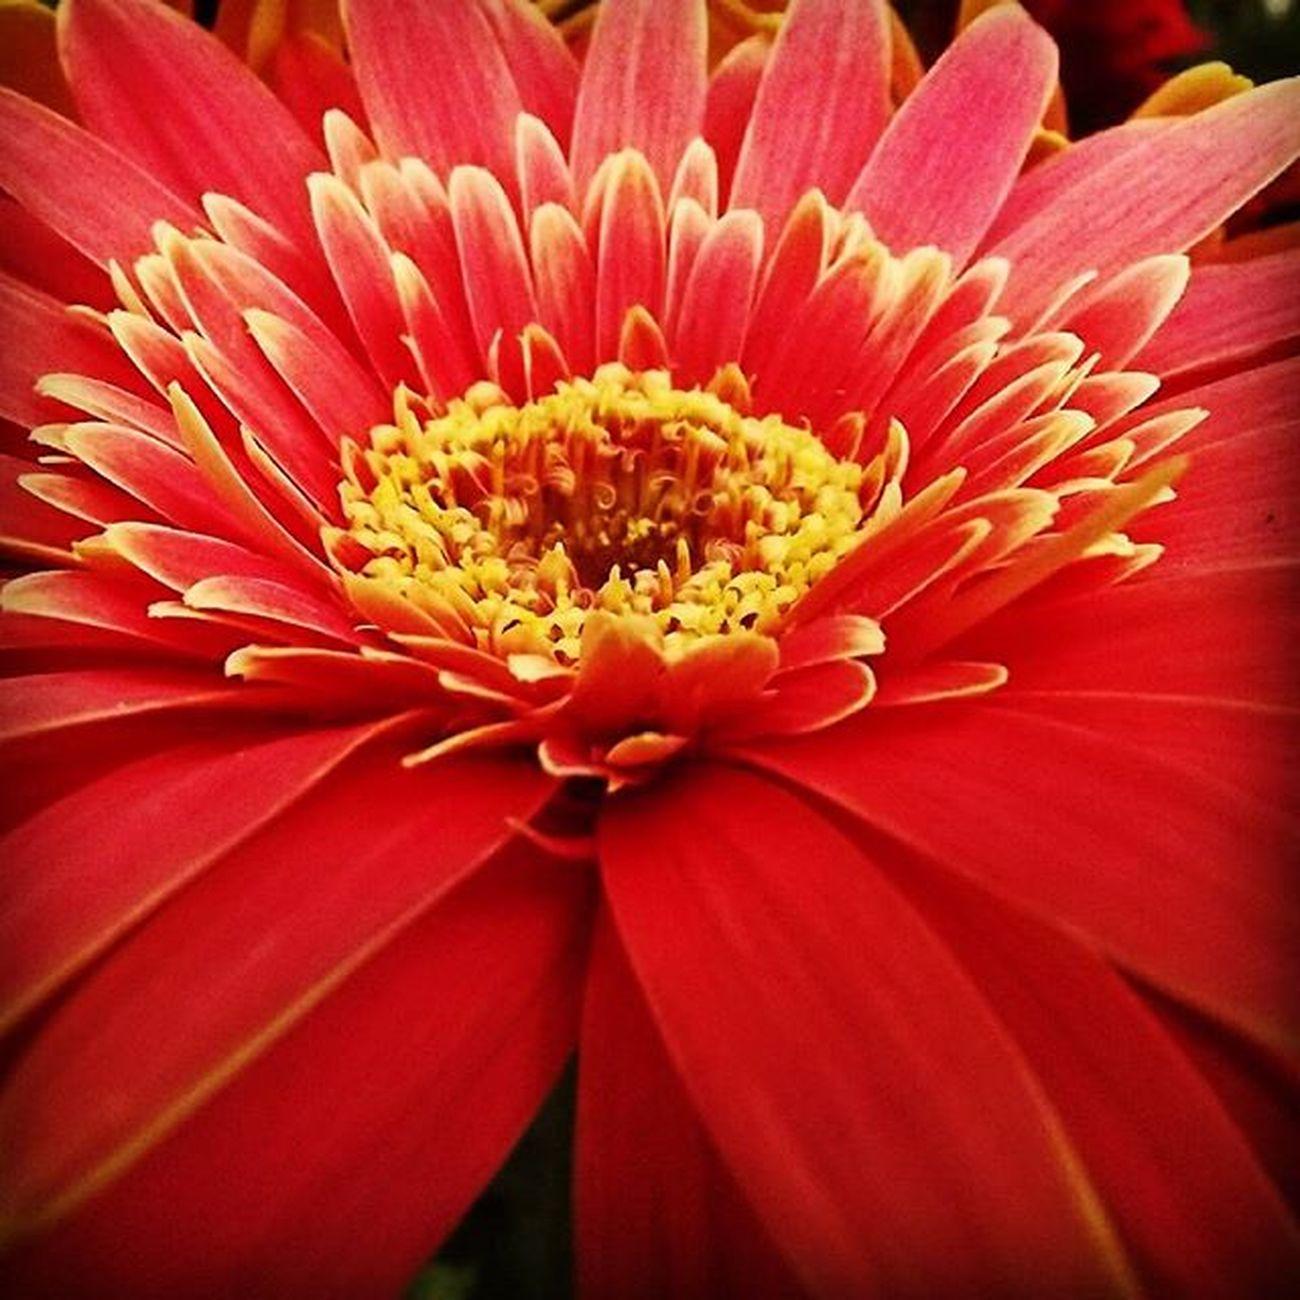 Nature Flower Macro Red Cornwallpark Gerbera Rw_happycolors 9Vaga_ColorRed9 Af_floral➡🌼flowers Tt_wt_rflora Ptk_flowers_red1 Hello_red